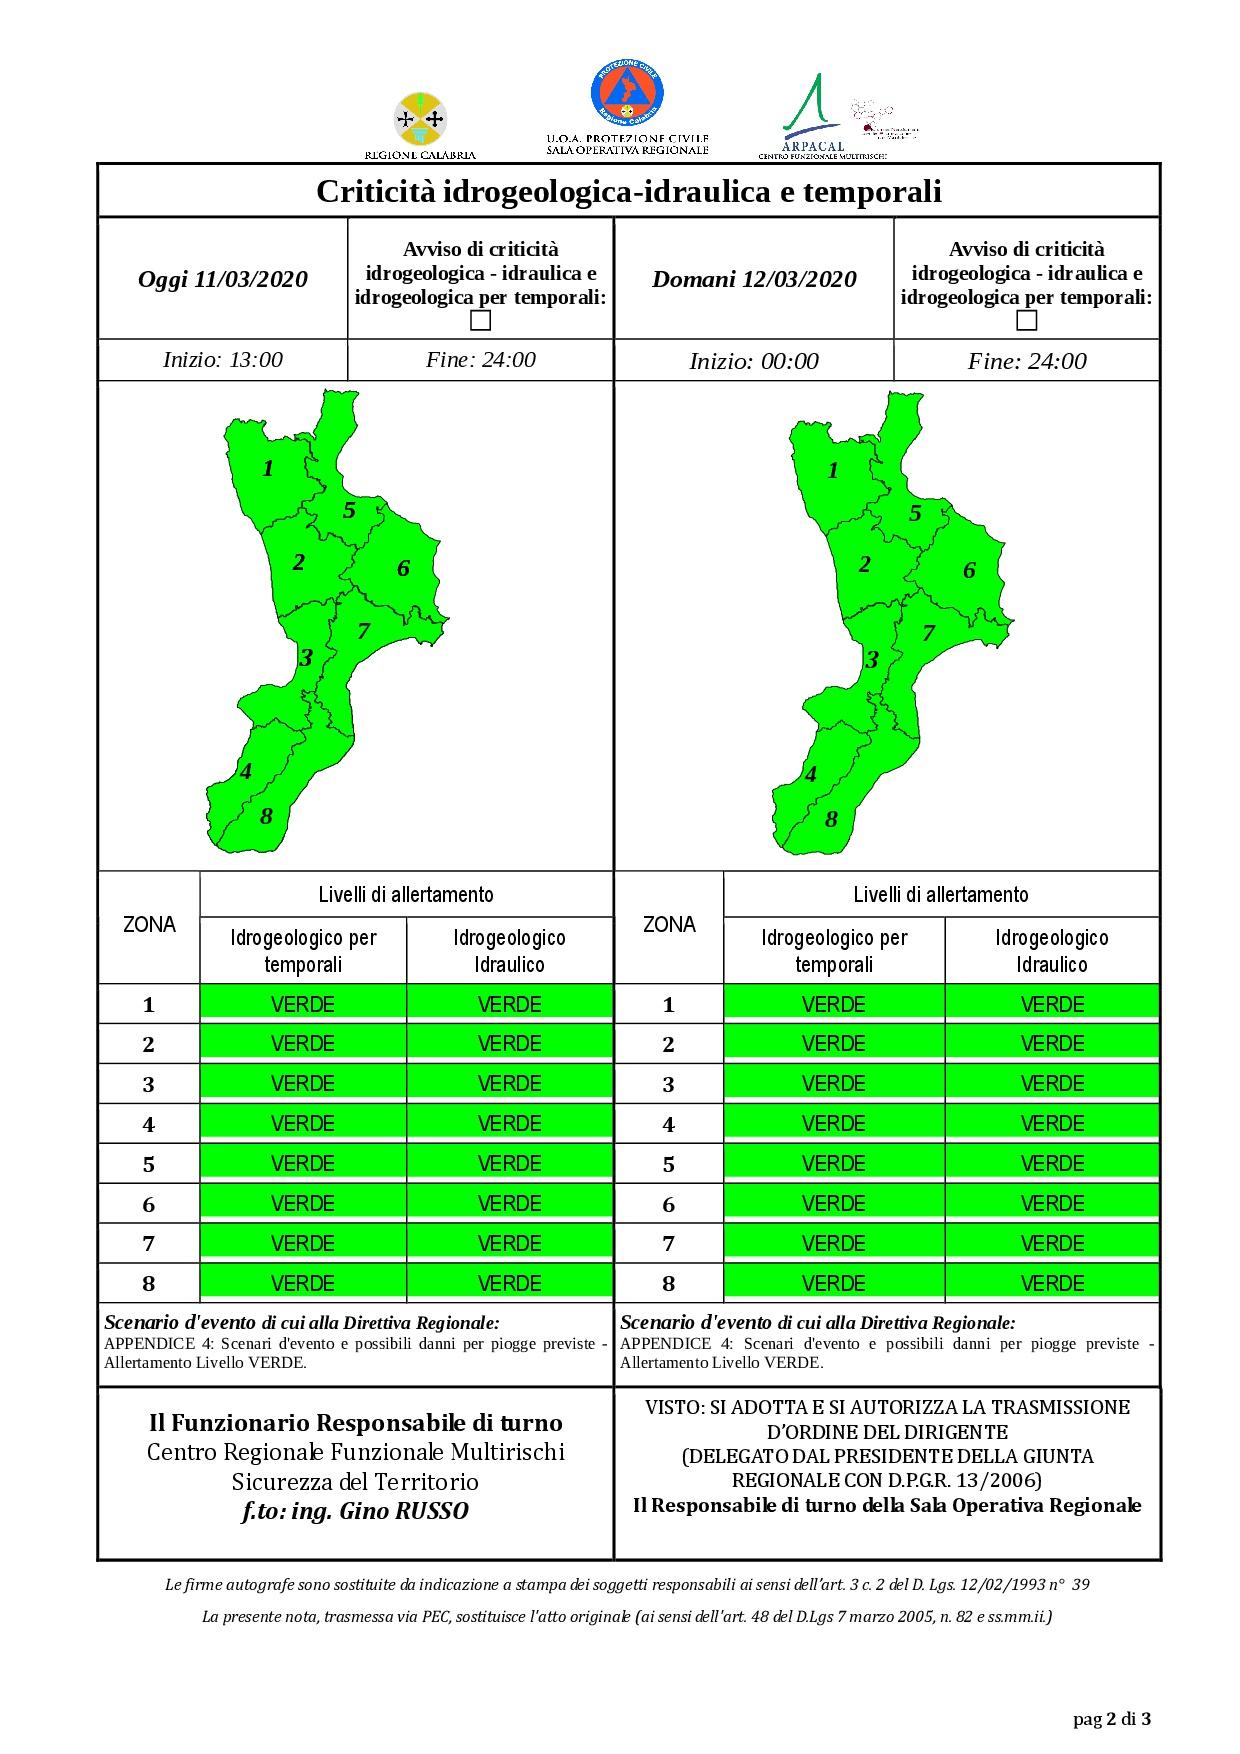 Criticità idrogeologica-idraulica e temporali in Calabria 11-03-2020